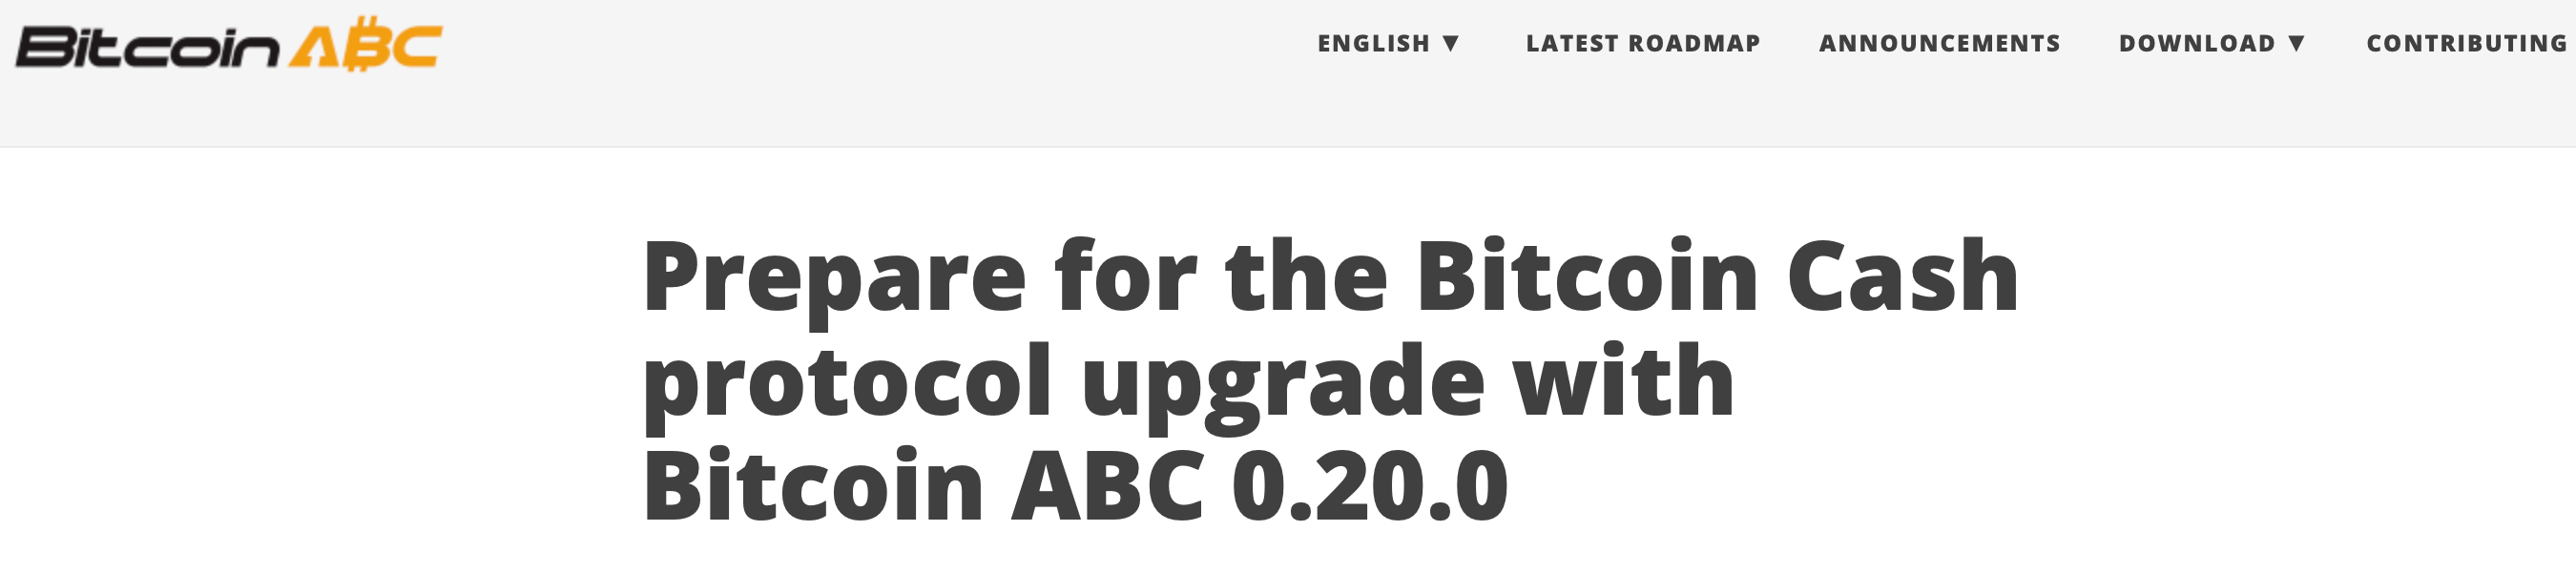 "Los proponentes de efectivo de Bitcoin se preparan para las próximas características de actualización ""width ="" 2700 ""height ="" 600 ""srcset ="" https: //news.bitcoin .com / wp-content / uploads / 2019/10 / prepare.jpg 2700w, https://news.bitcoin.com/wp-content/uploads/2019/10/prepare-300x67.jpg 300w, https: // noticias .bitcoin.com / wp-content / uploads / 2019/10 / prepare-768x171.jpg 768w, https://news.bitcoin.com/wp-content/uploads/2019/10/prepare-1024x228.jpg 1024w, https : //news.bitcoin.com/wp-content/uploads/2019/10/prepare-696x155.jpg 696w, https://news.bitcoin.com/wp-content/uploads/2019/10/prepare-1392x309. jpg 1392w, https://news.bitcoin.com/wp-content/uploads/2019/10/prepare-1068x237.jpg 1068w ""tamaños ="" (ancho máximo: 2700px) 100vw, 2700px"